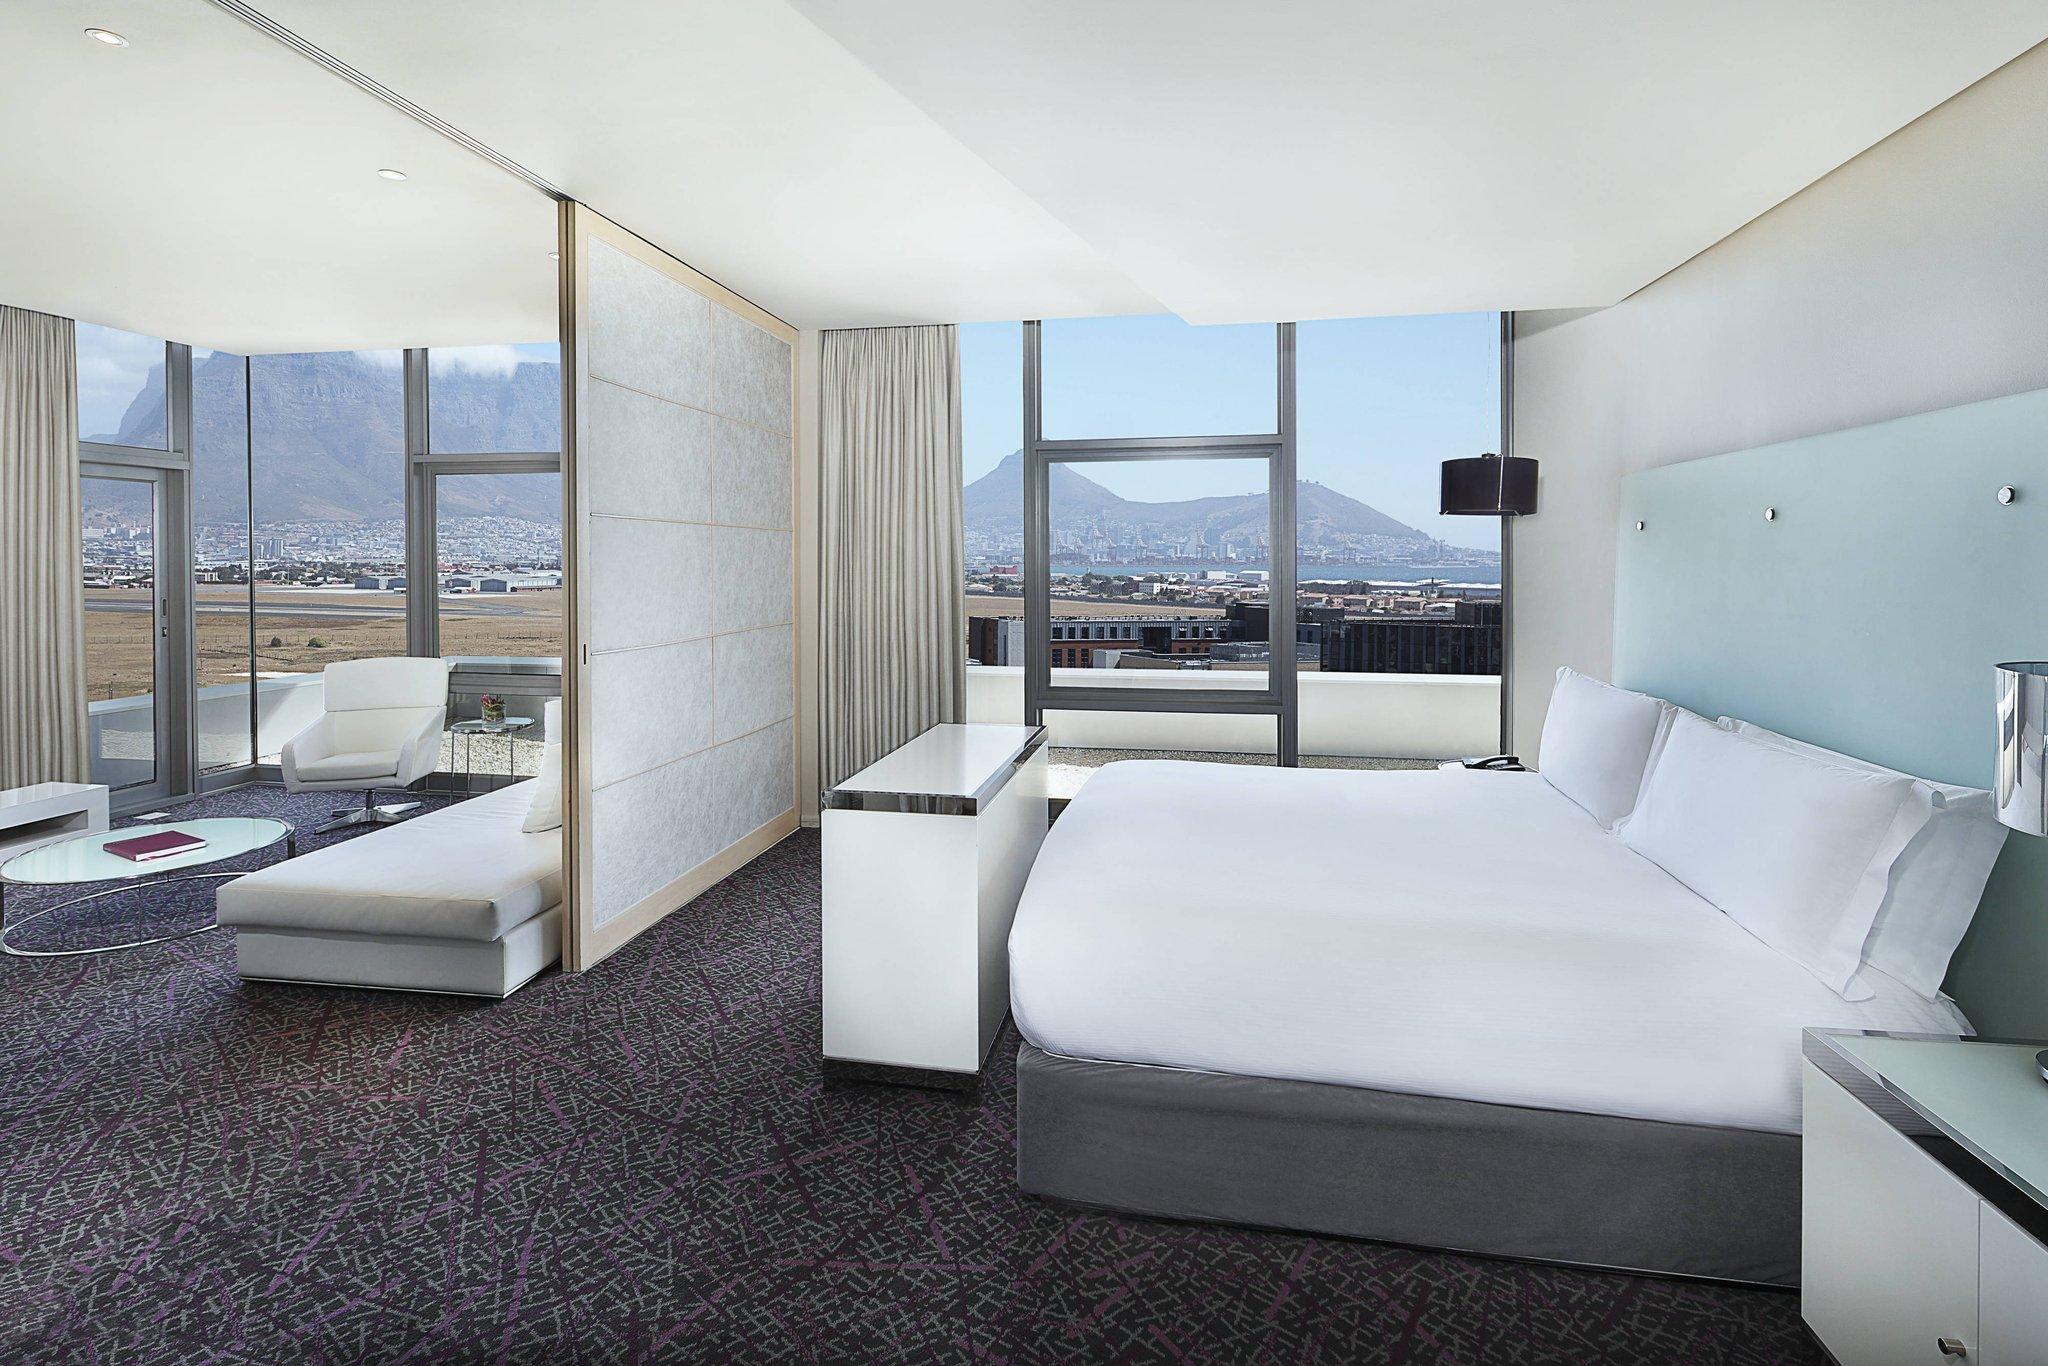 هتل کیپ تاون ماریوت کریستال توورس